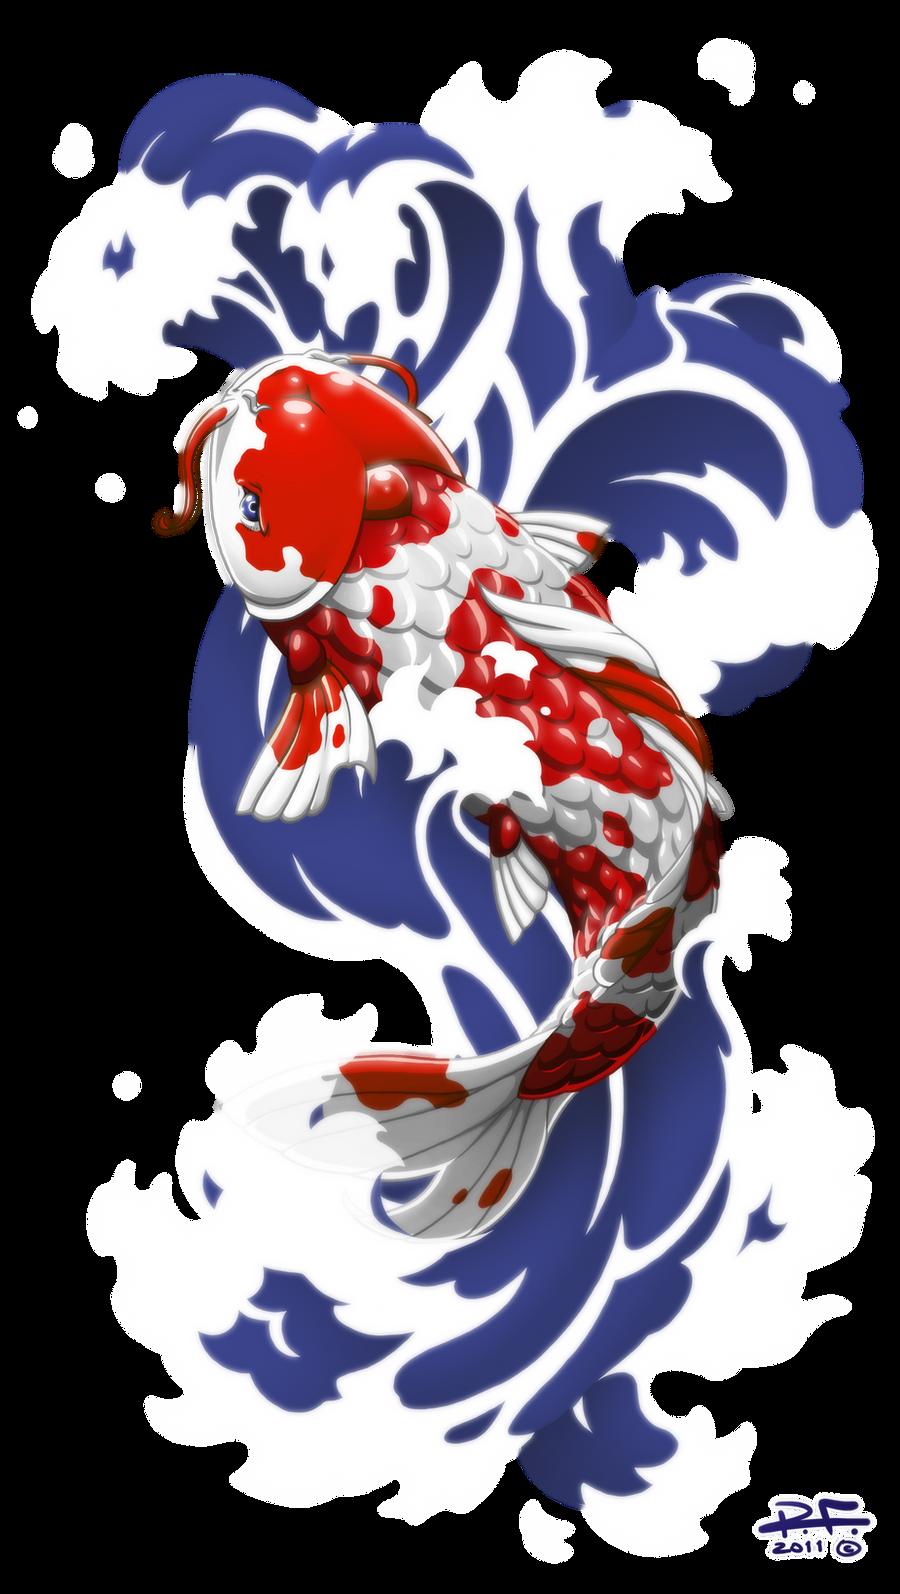 Red koi by pandaphobia on deviantart for Koi carp artwork